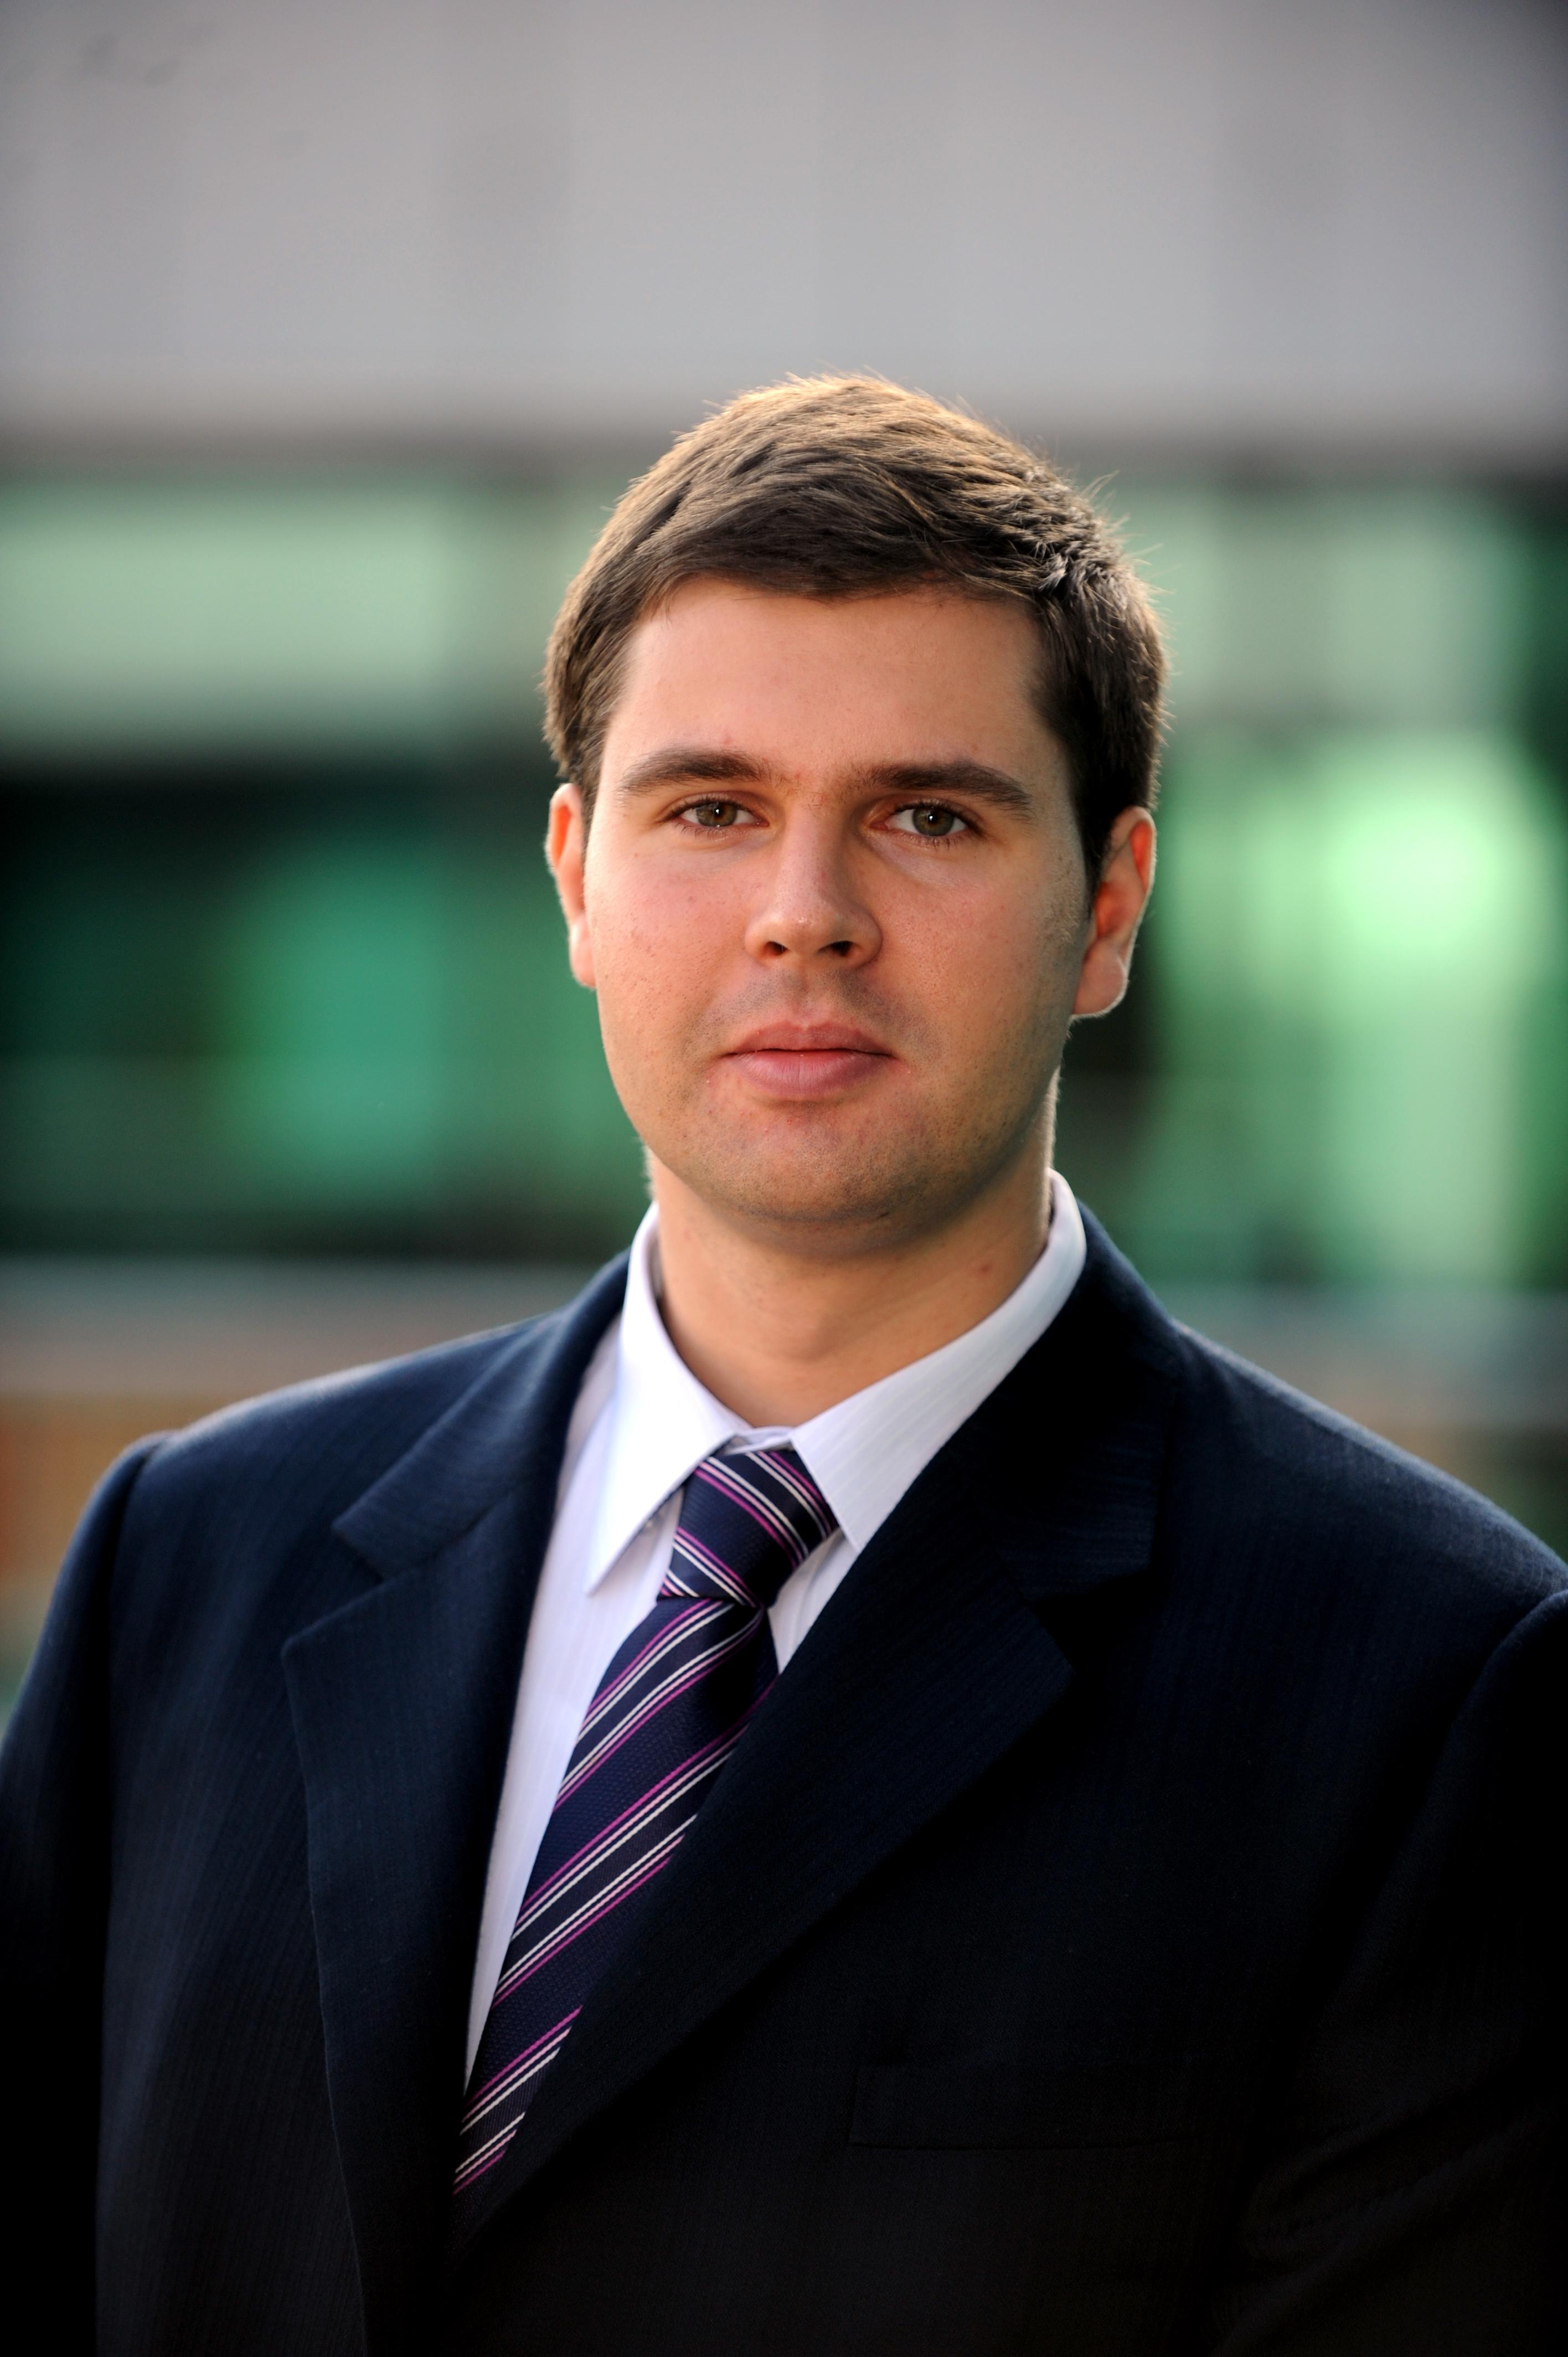 Silviu Badescu